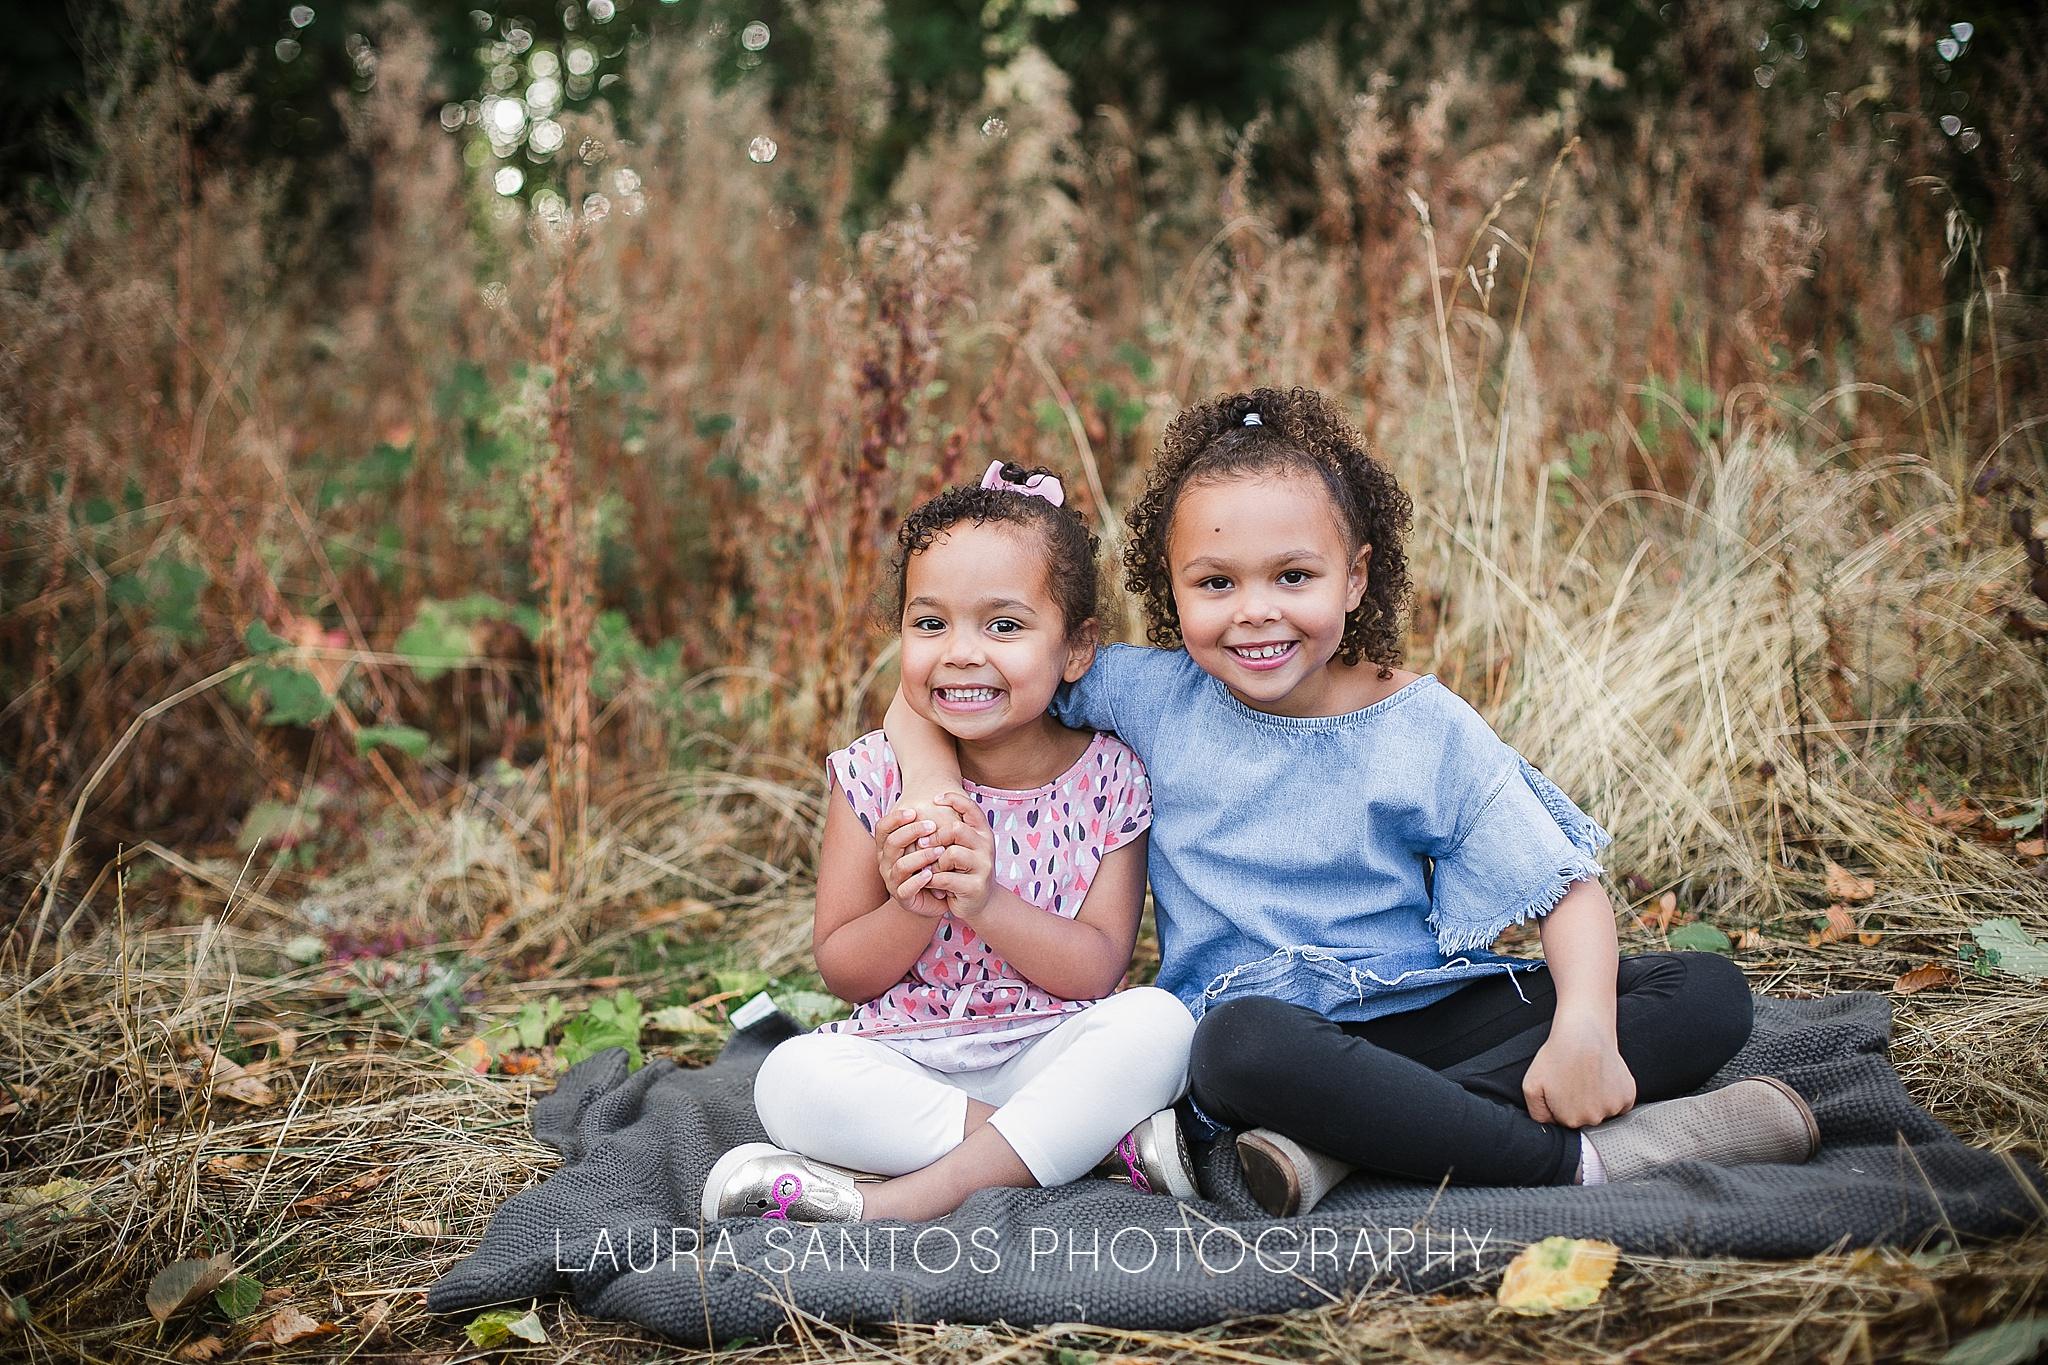 Laura Santos Photography Portland Oregon Family Photographer_0672.jpg